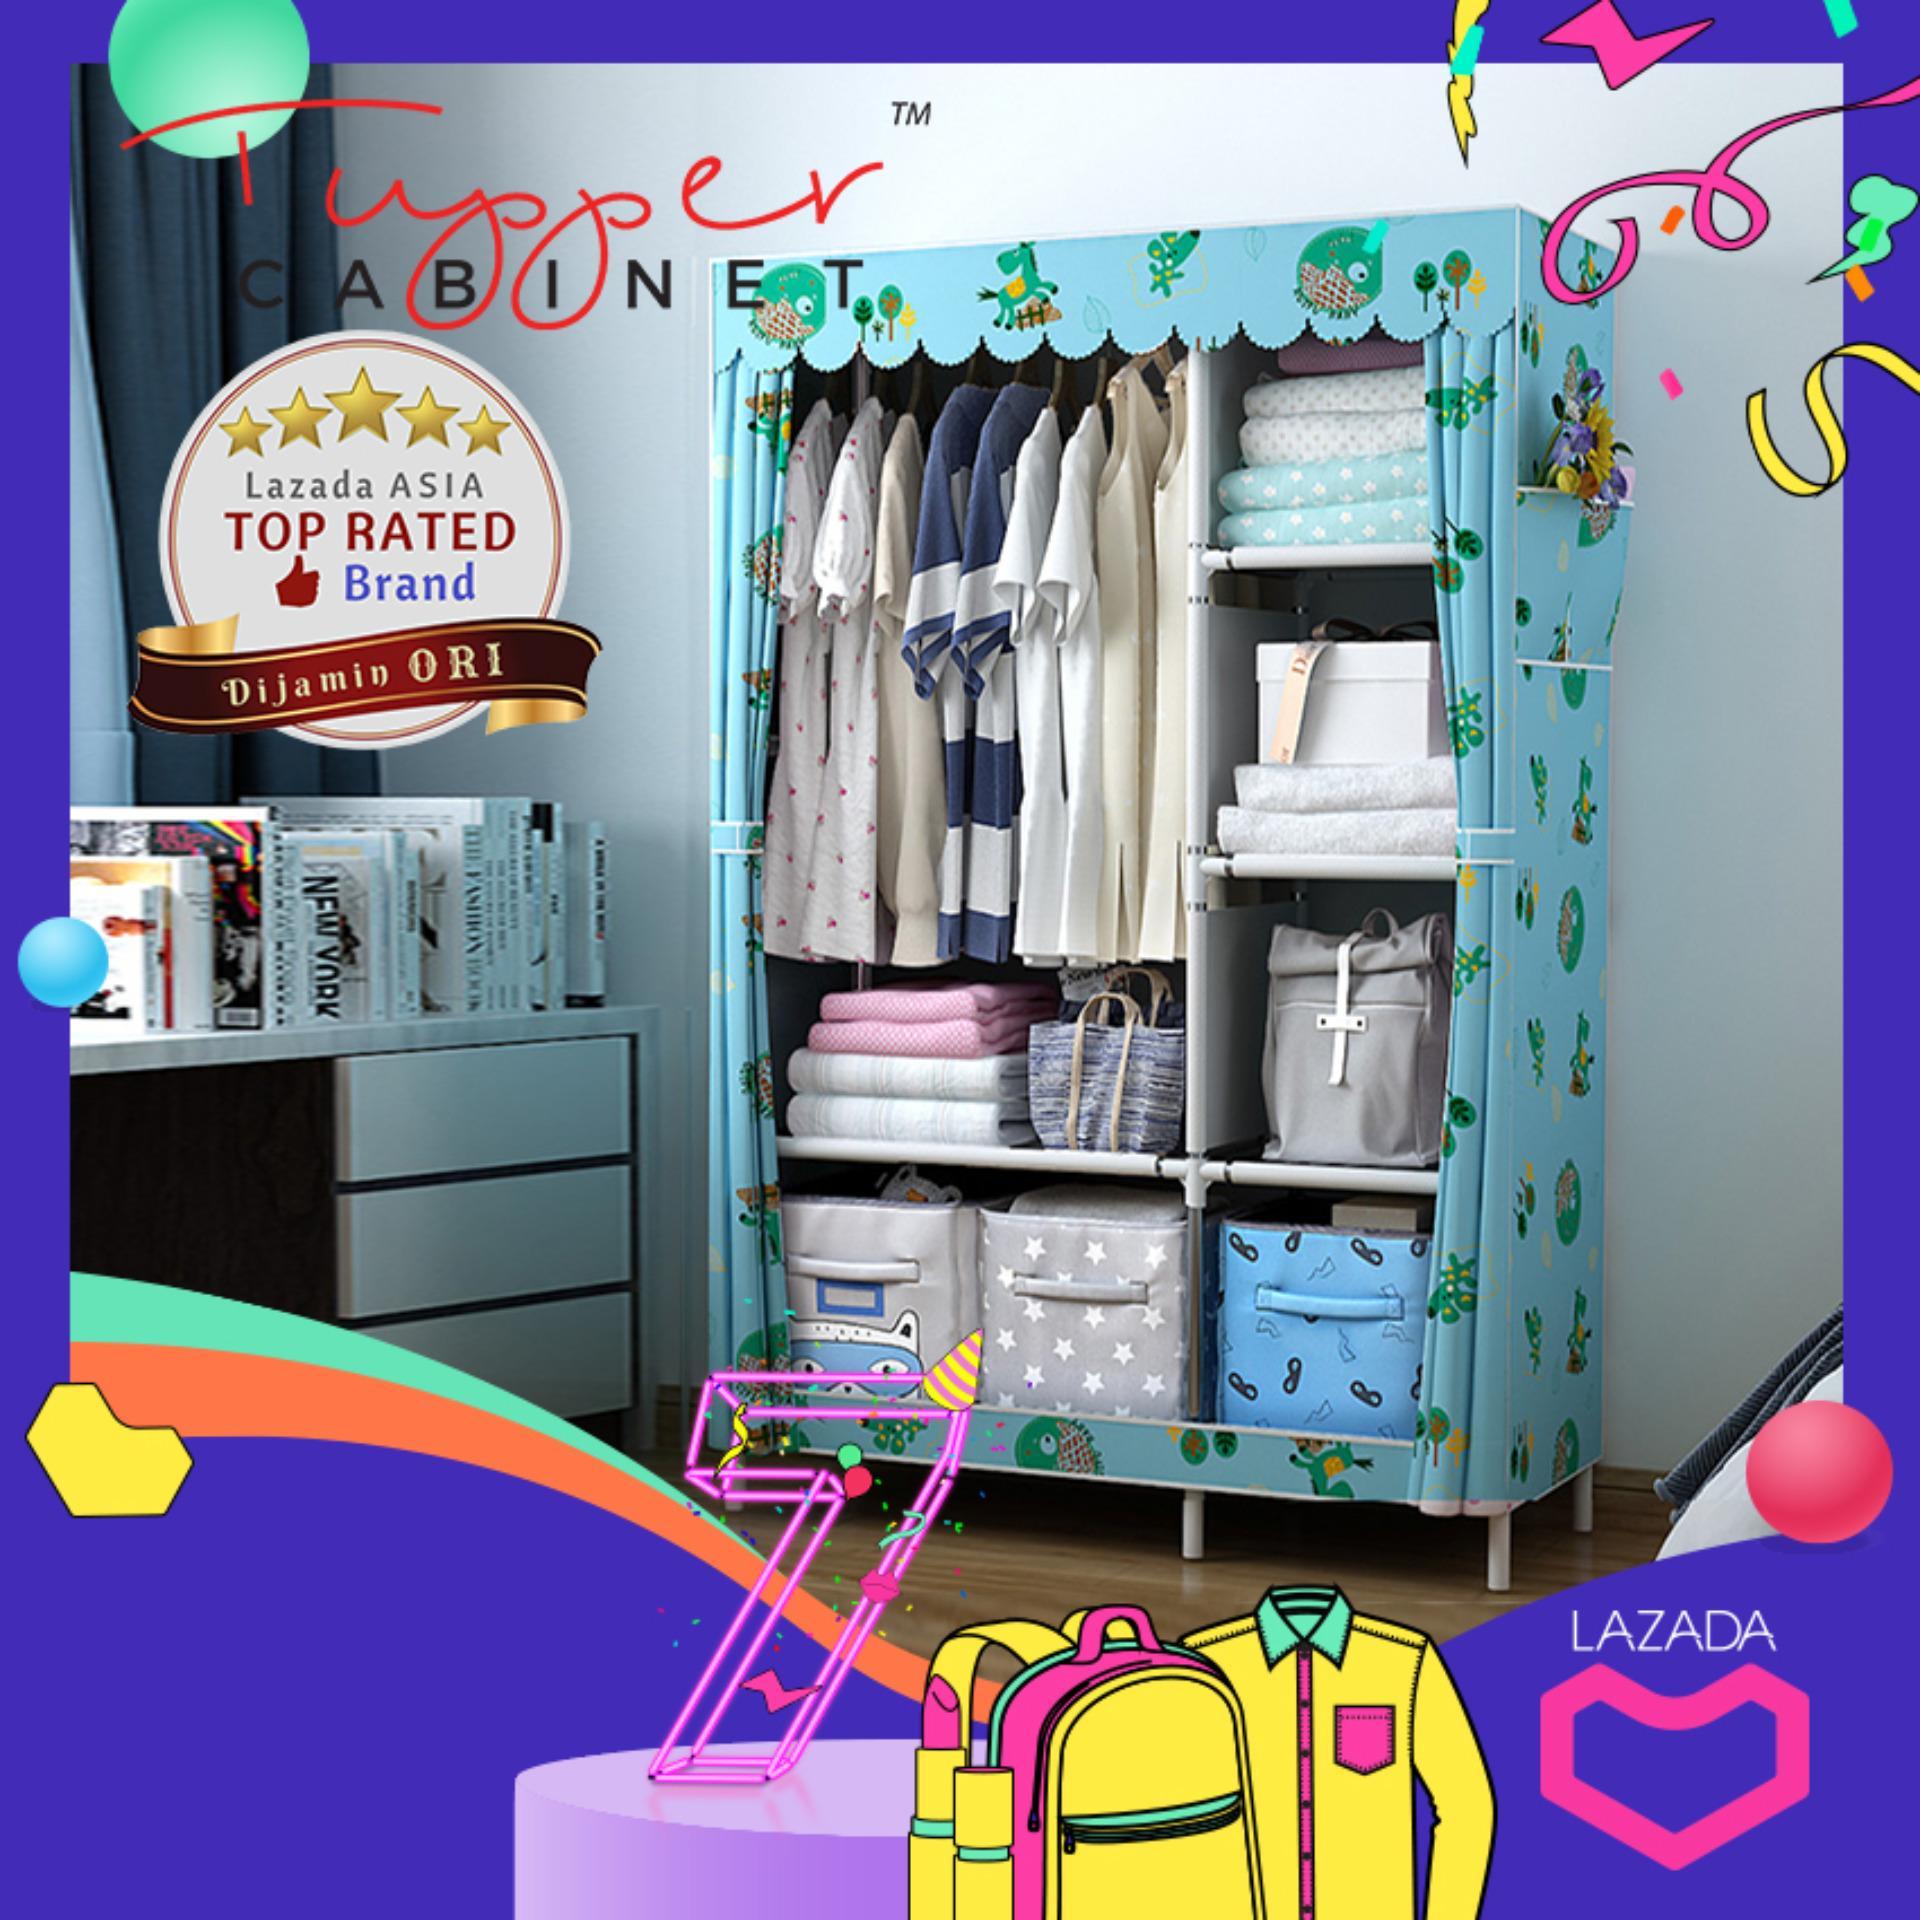 Lemari Pakaian Portable Cloth Rack Serbaguna Organizer Rak Baju Wardrobe Portabel Closet Kain Non-Woven